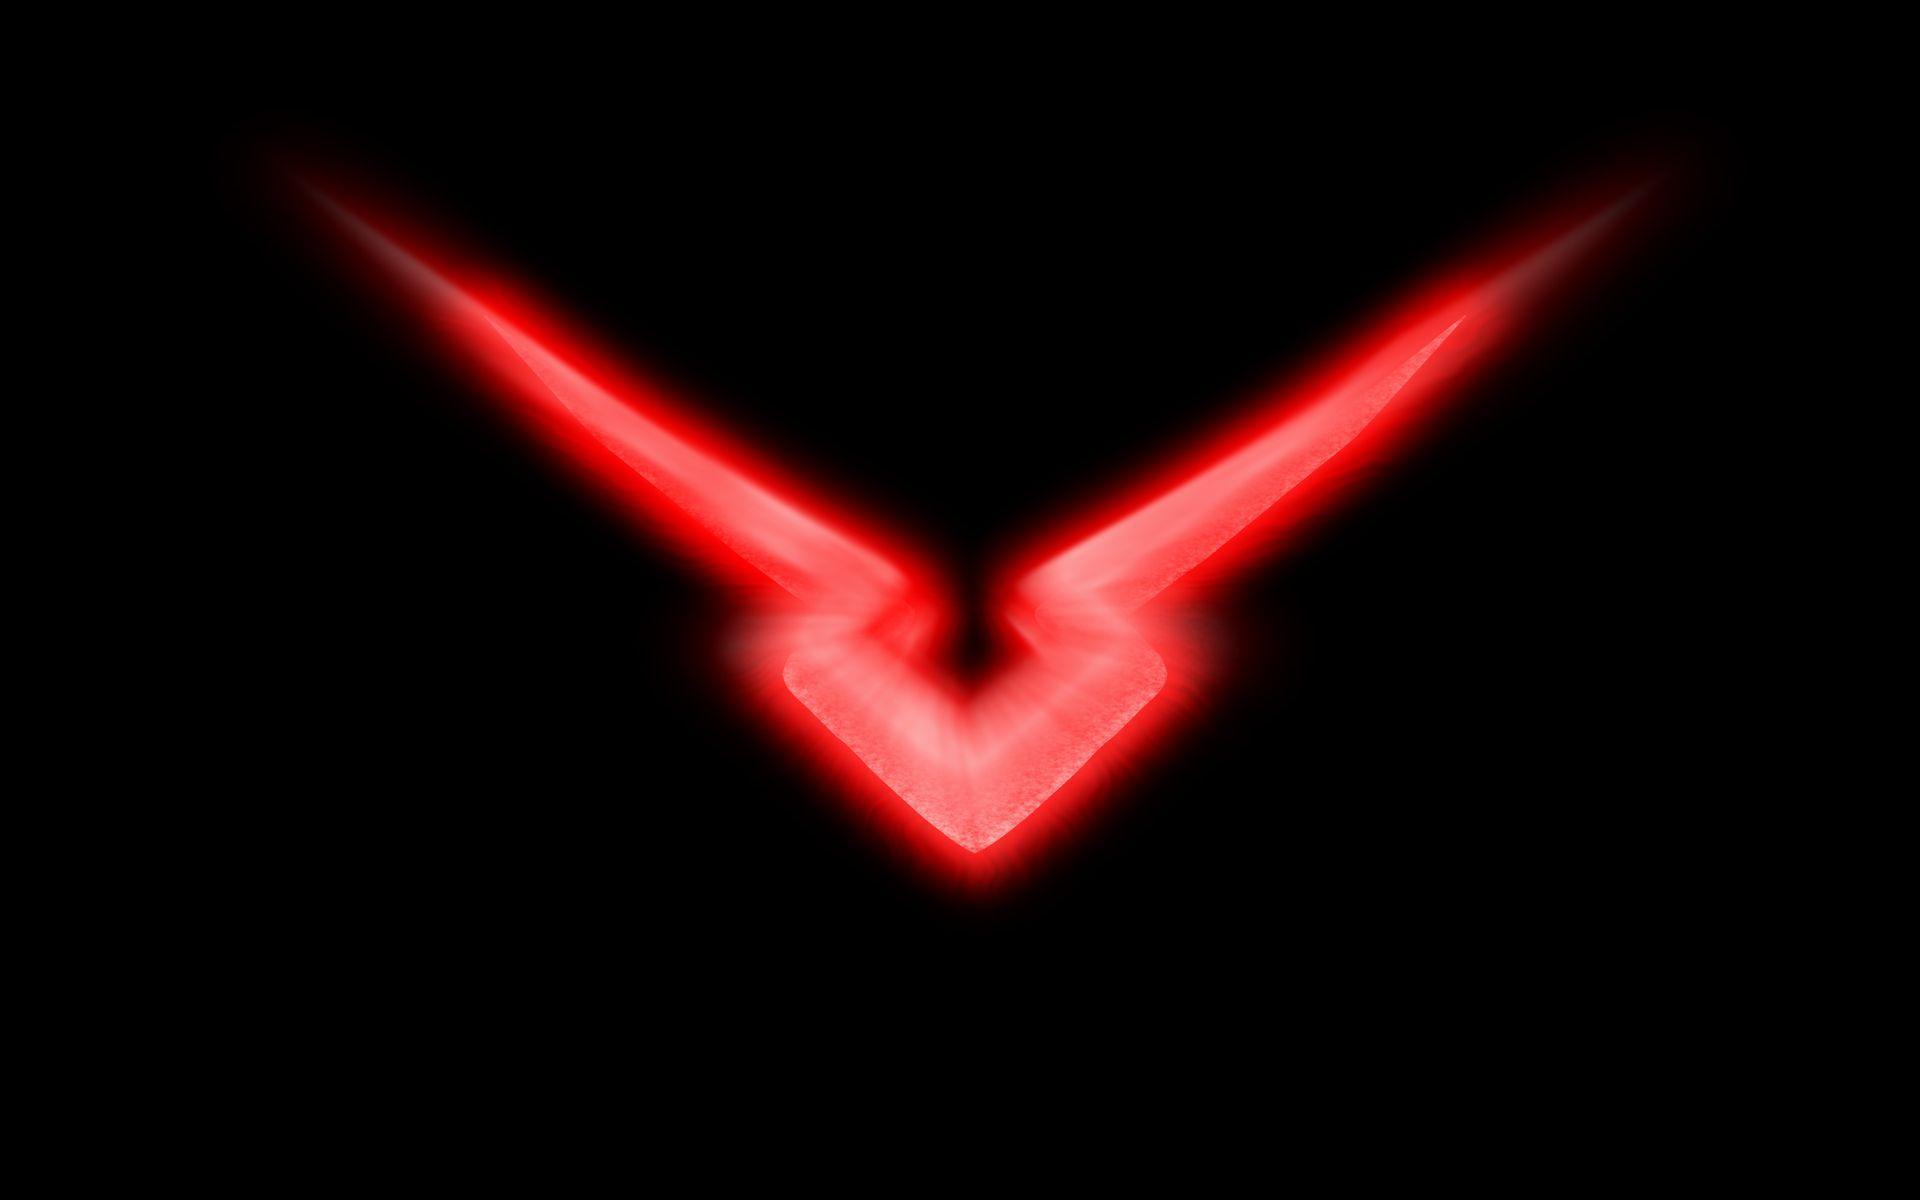 Download 800+ Wallpaper Black Red Keren HD Gratis